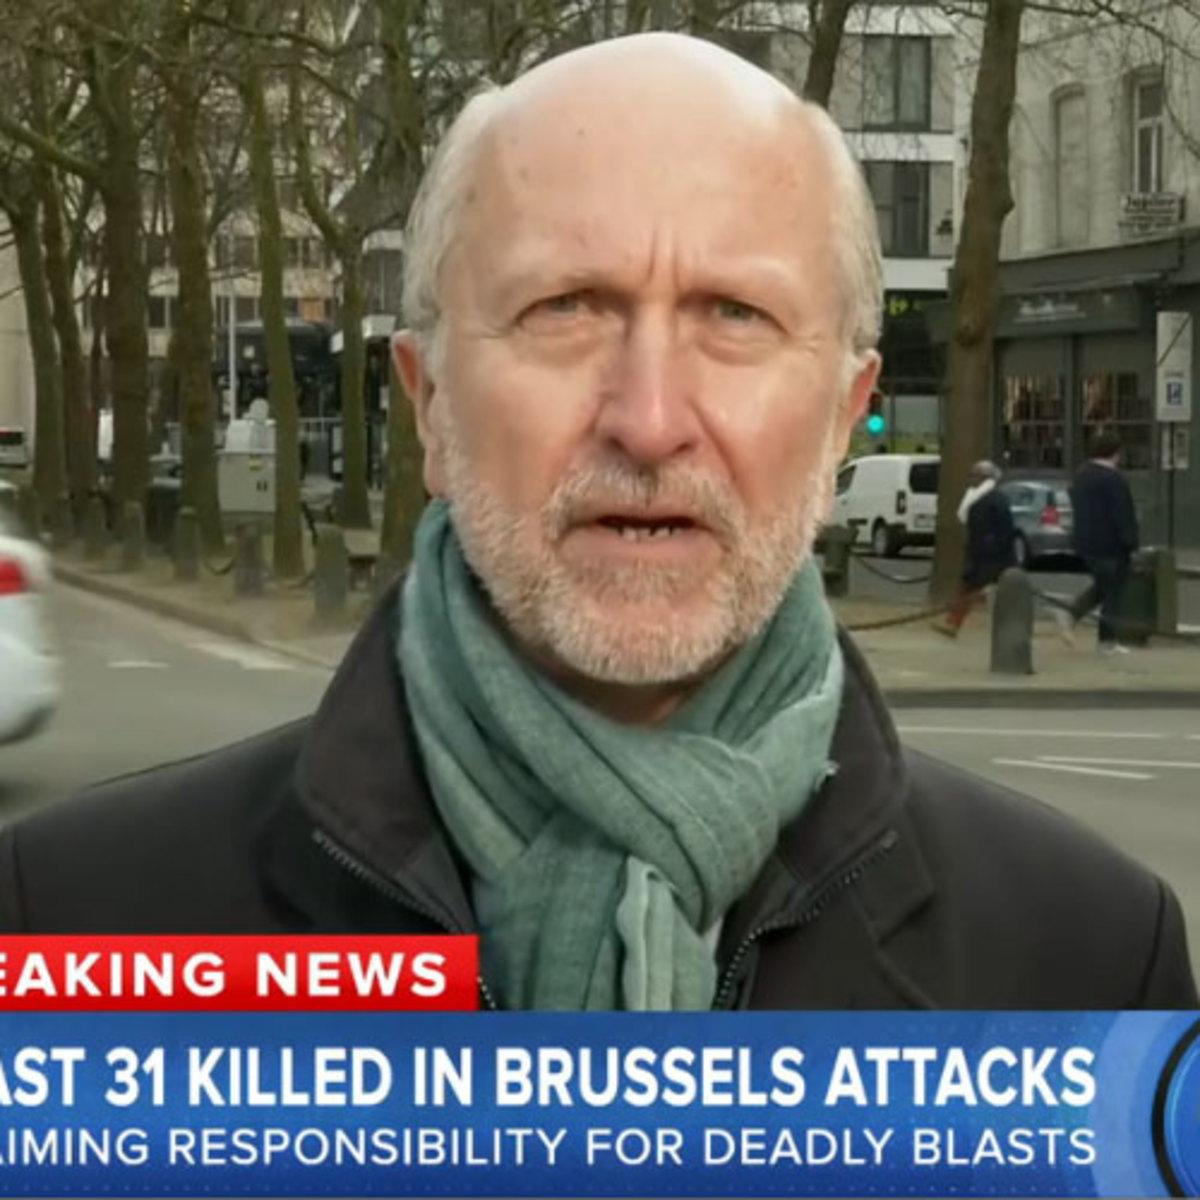 msnbc-gangster-rap-to-belgium-terror-attacks.jpg